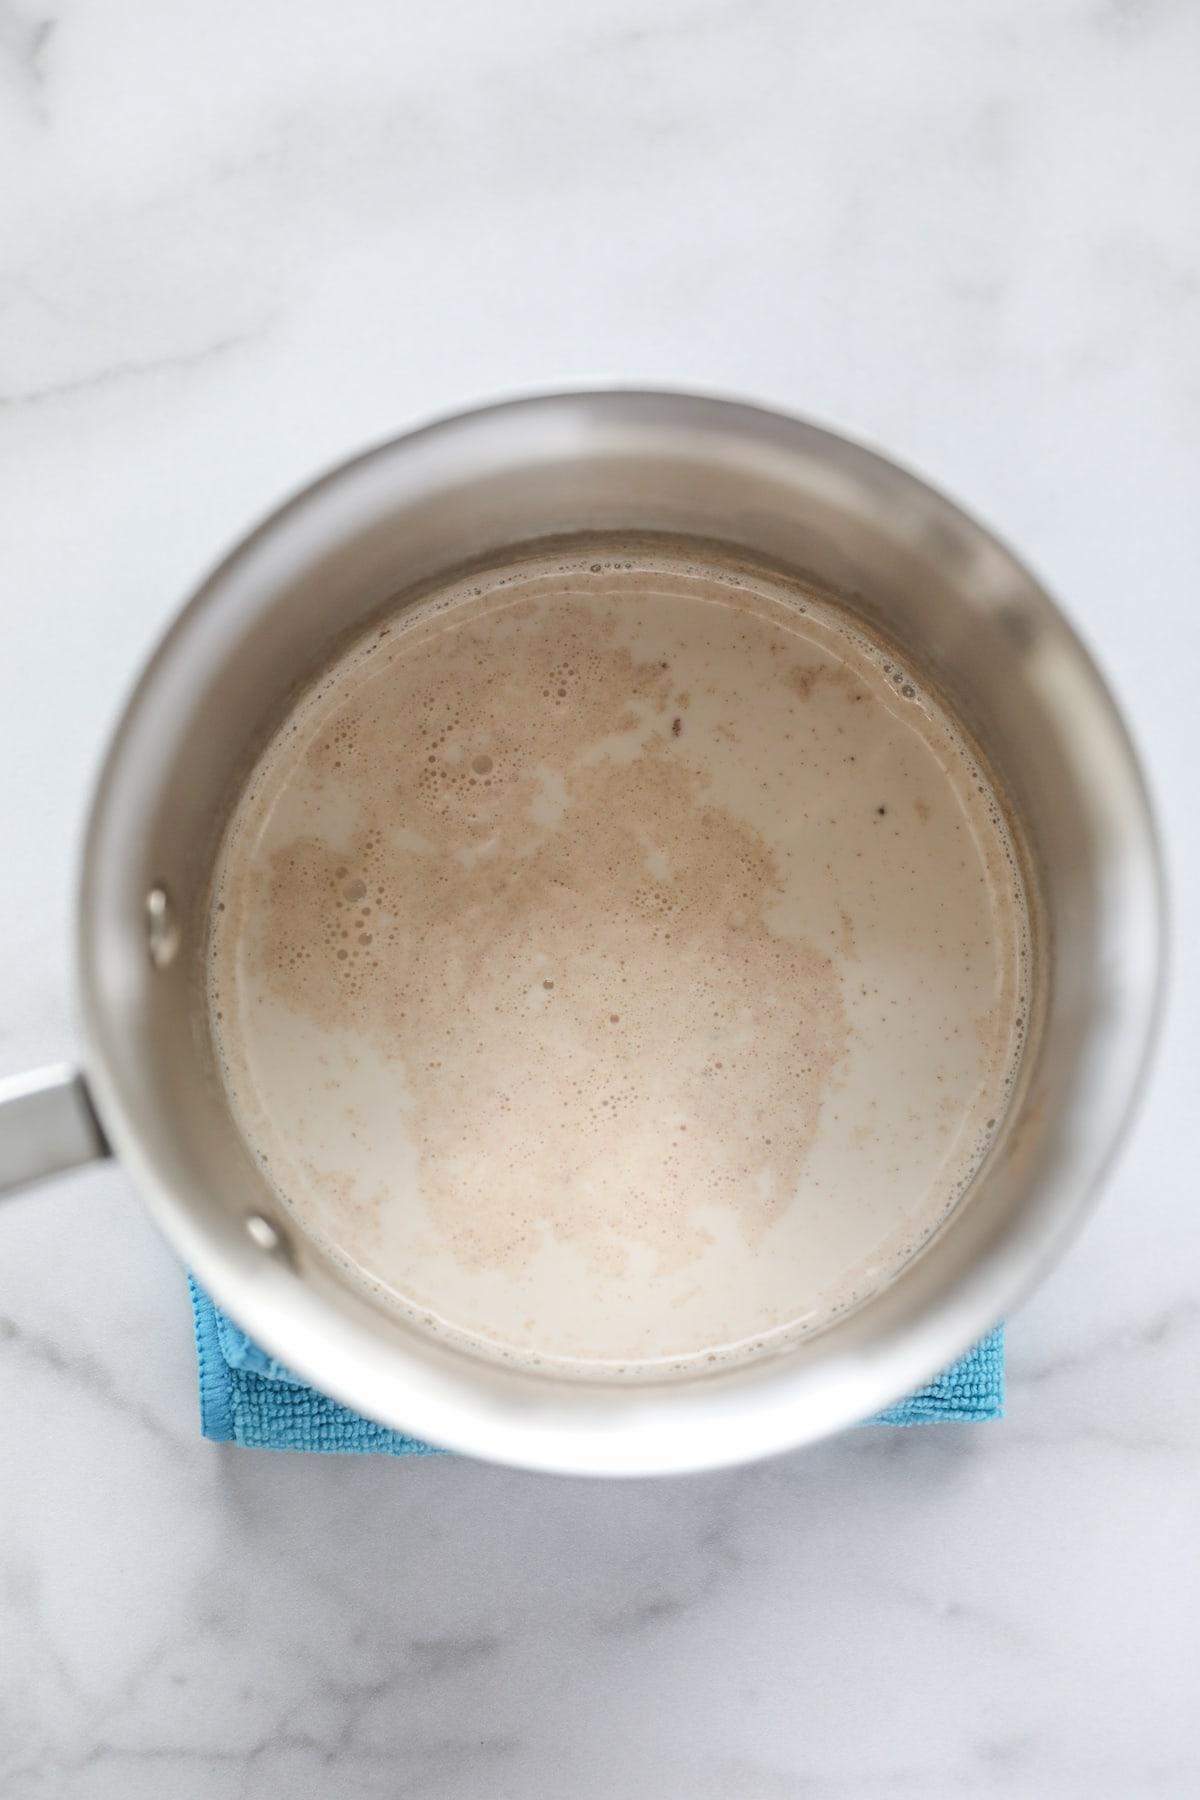 hot milk, cinnamon and nutmeg in saucepan